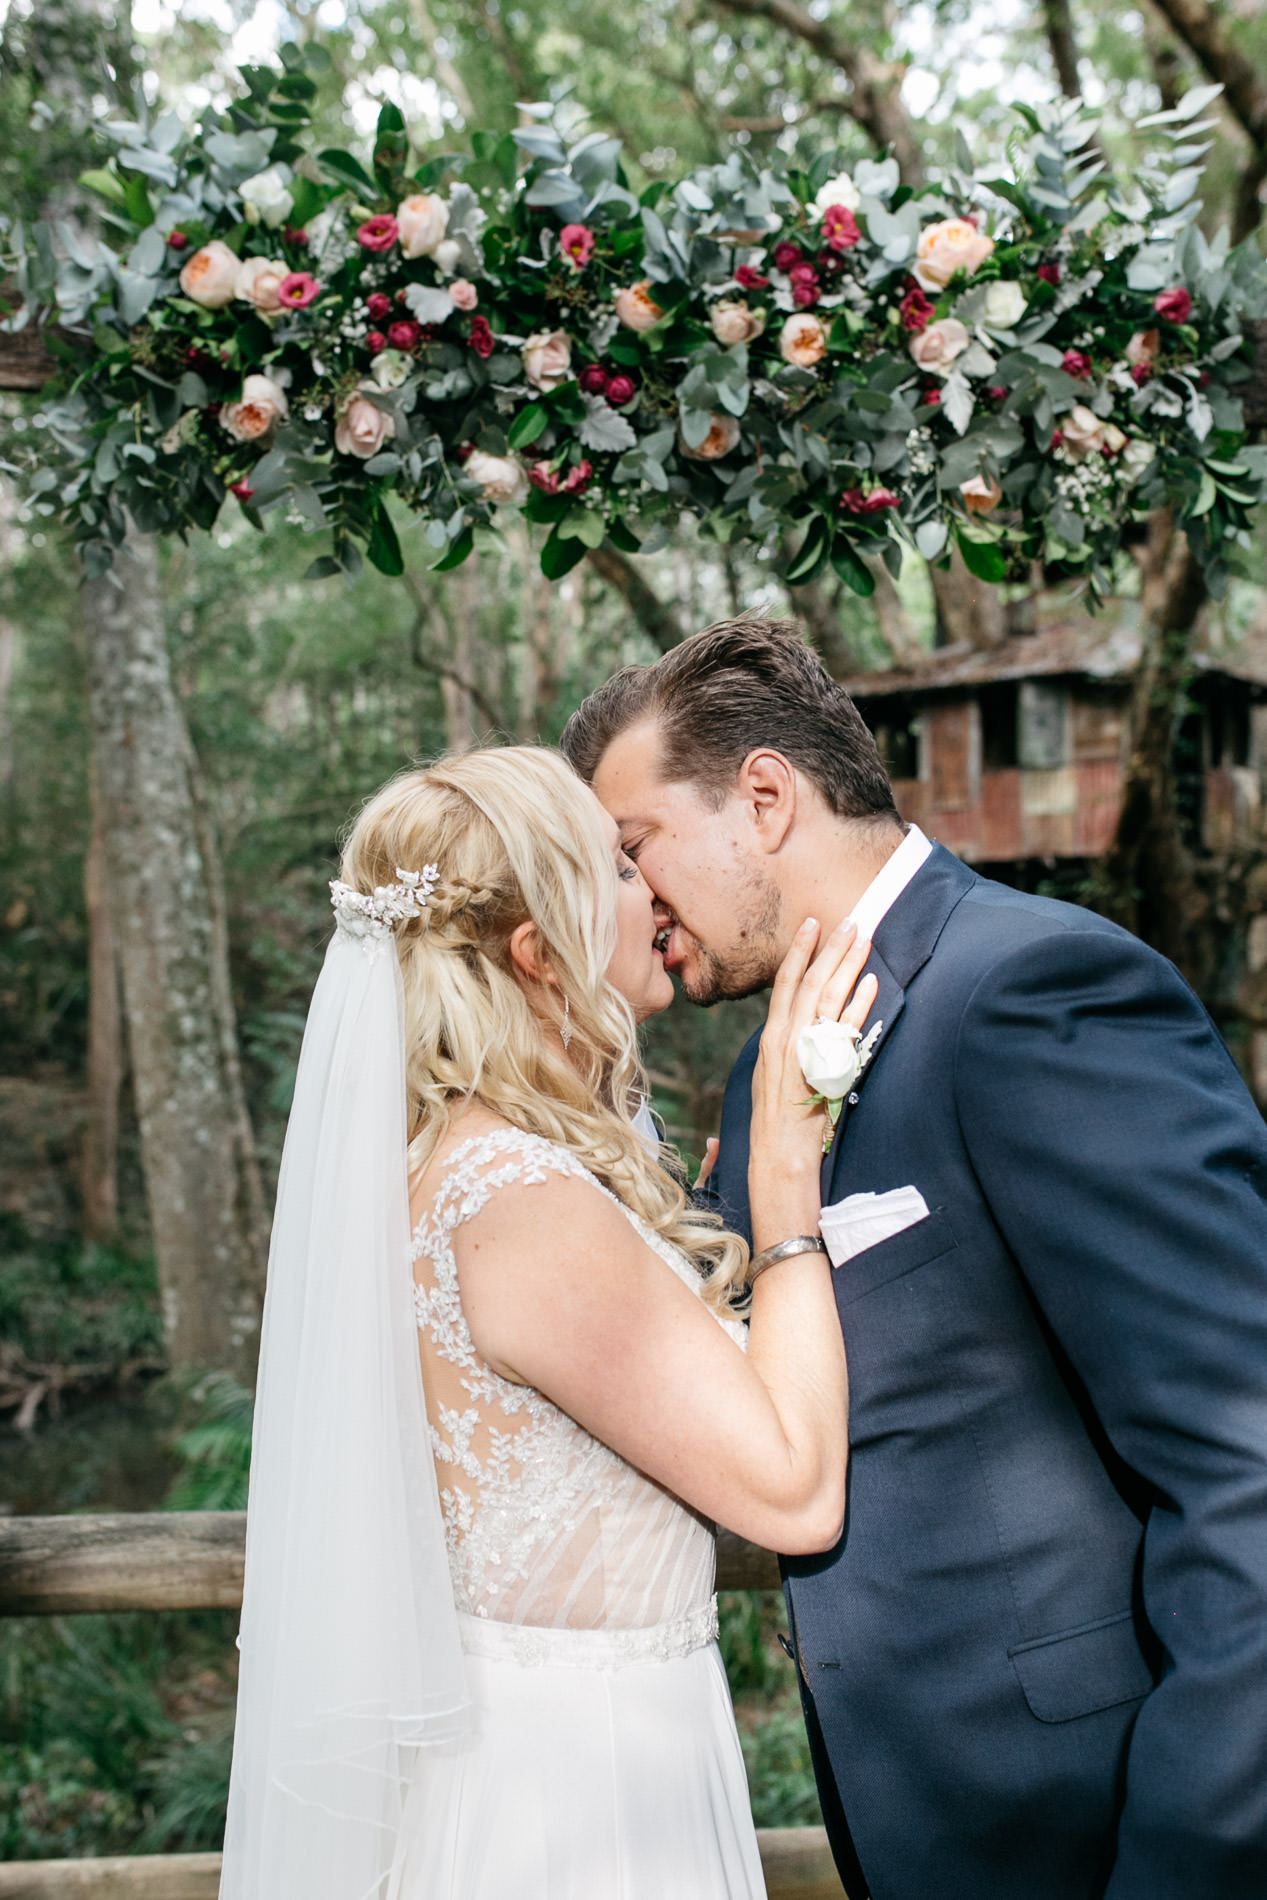 True North Photography_Boomerang Farm_Stacey and Isaac_Gold Coast Wedding_Barm Wedding_Hinterland Wedding-104.jpg